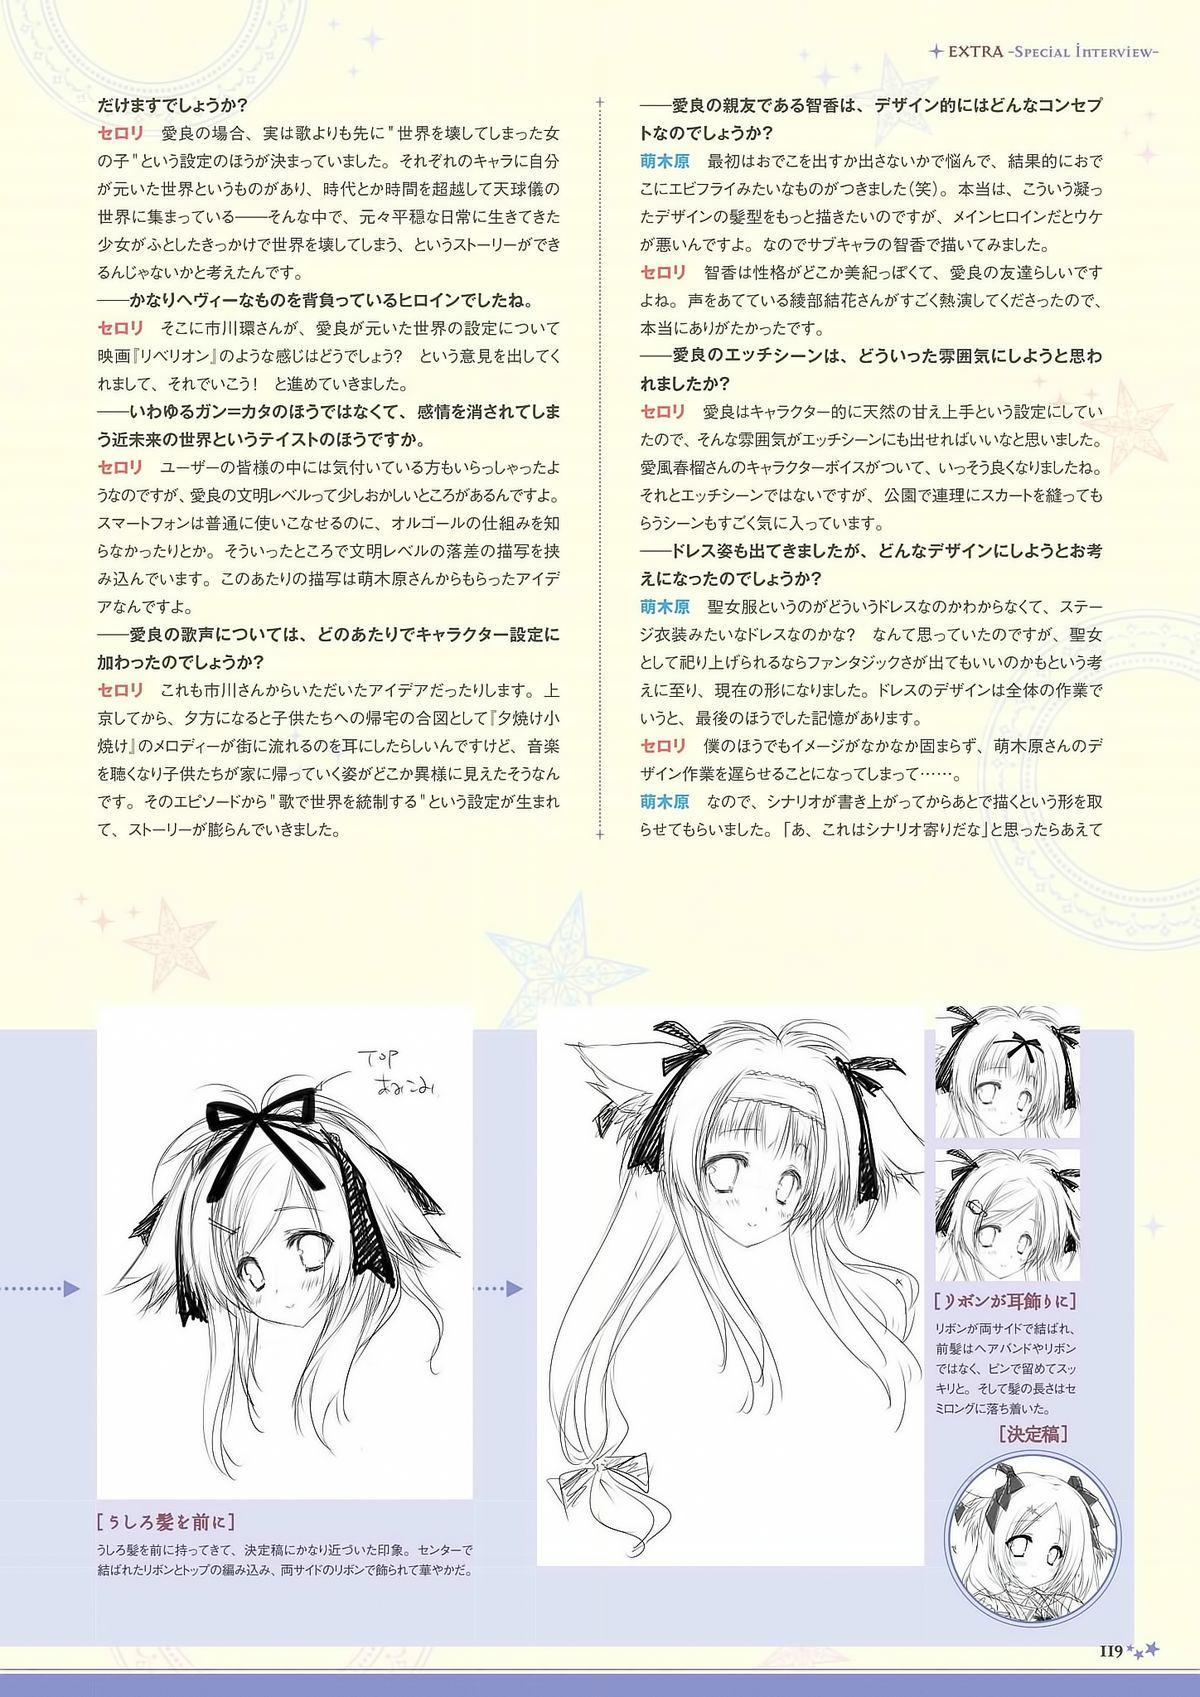 Sekai to Sekai no Mannaka de Visual Fanbook 116